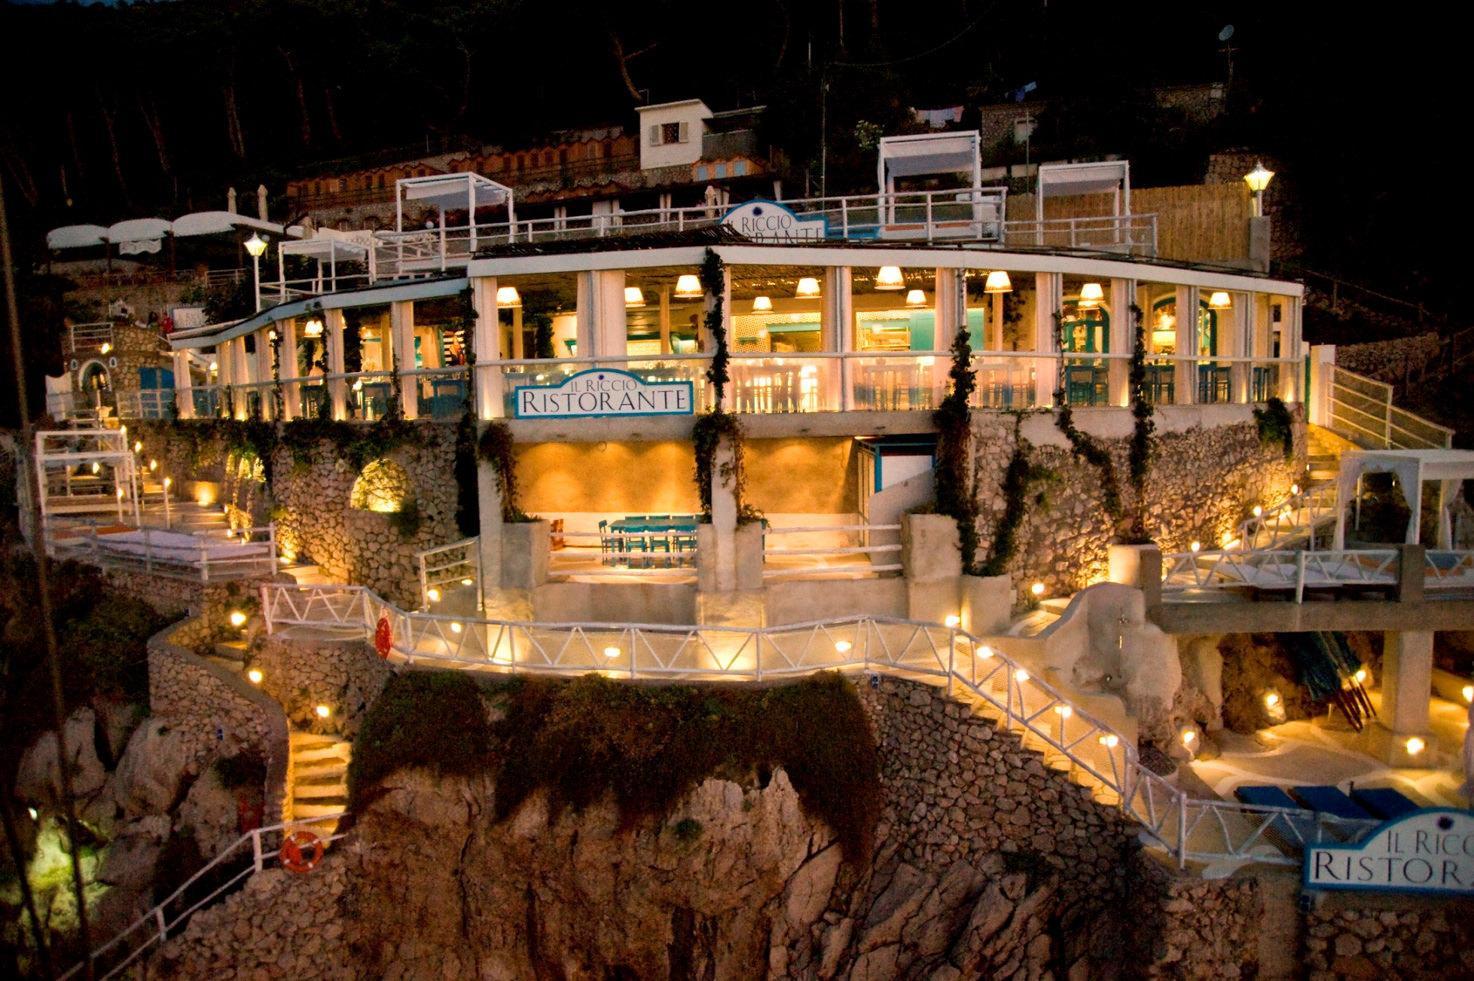 Il Riccio restaurant by night